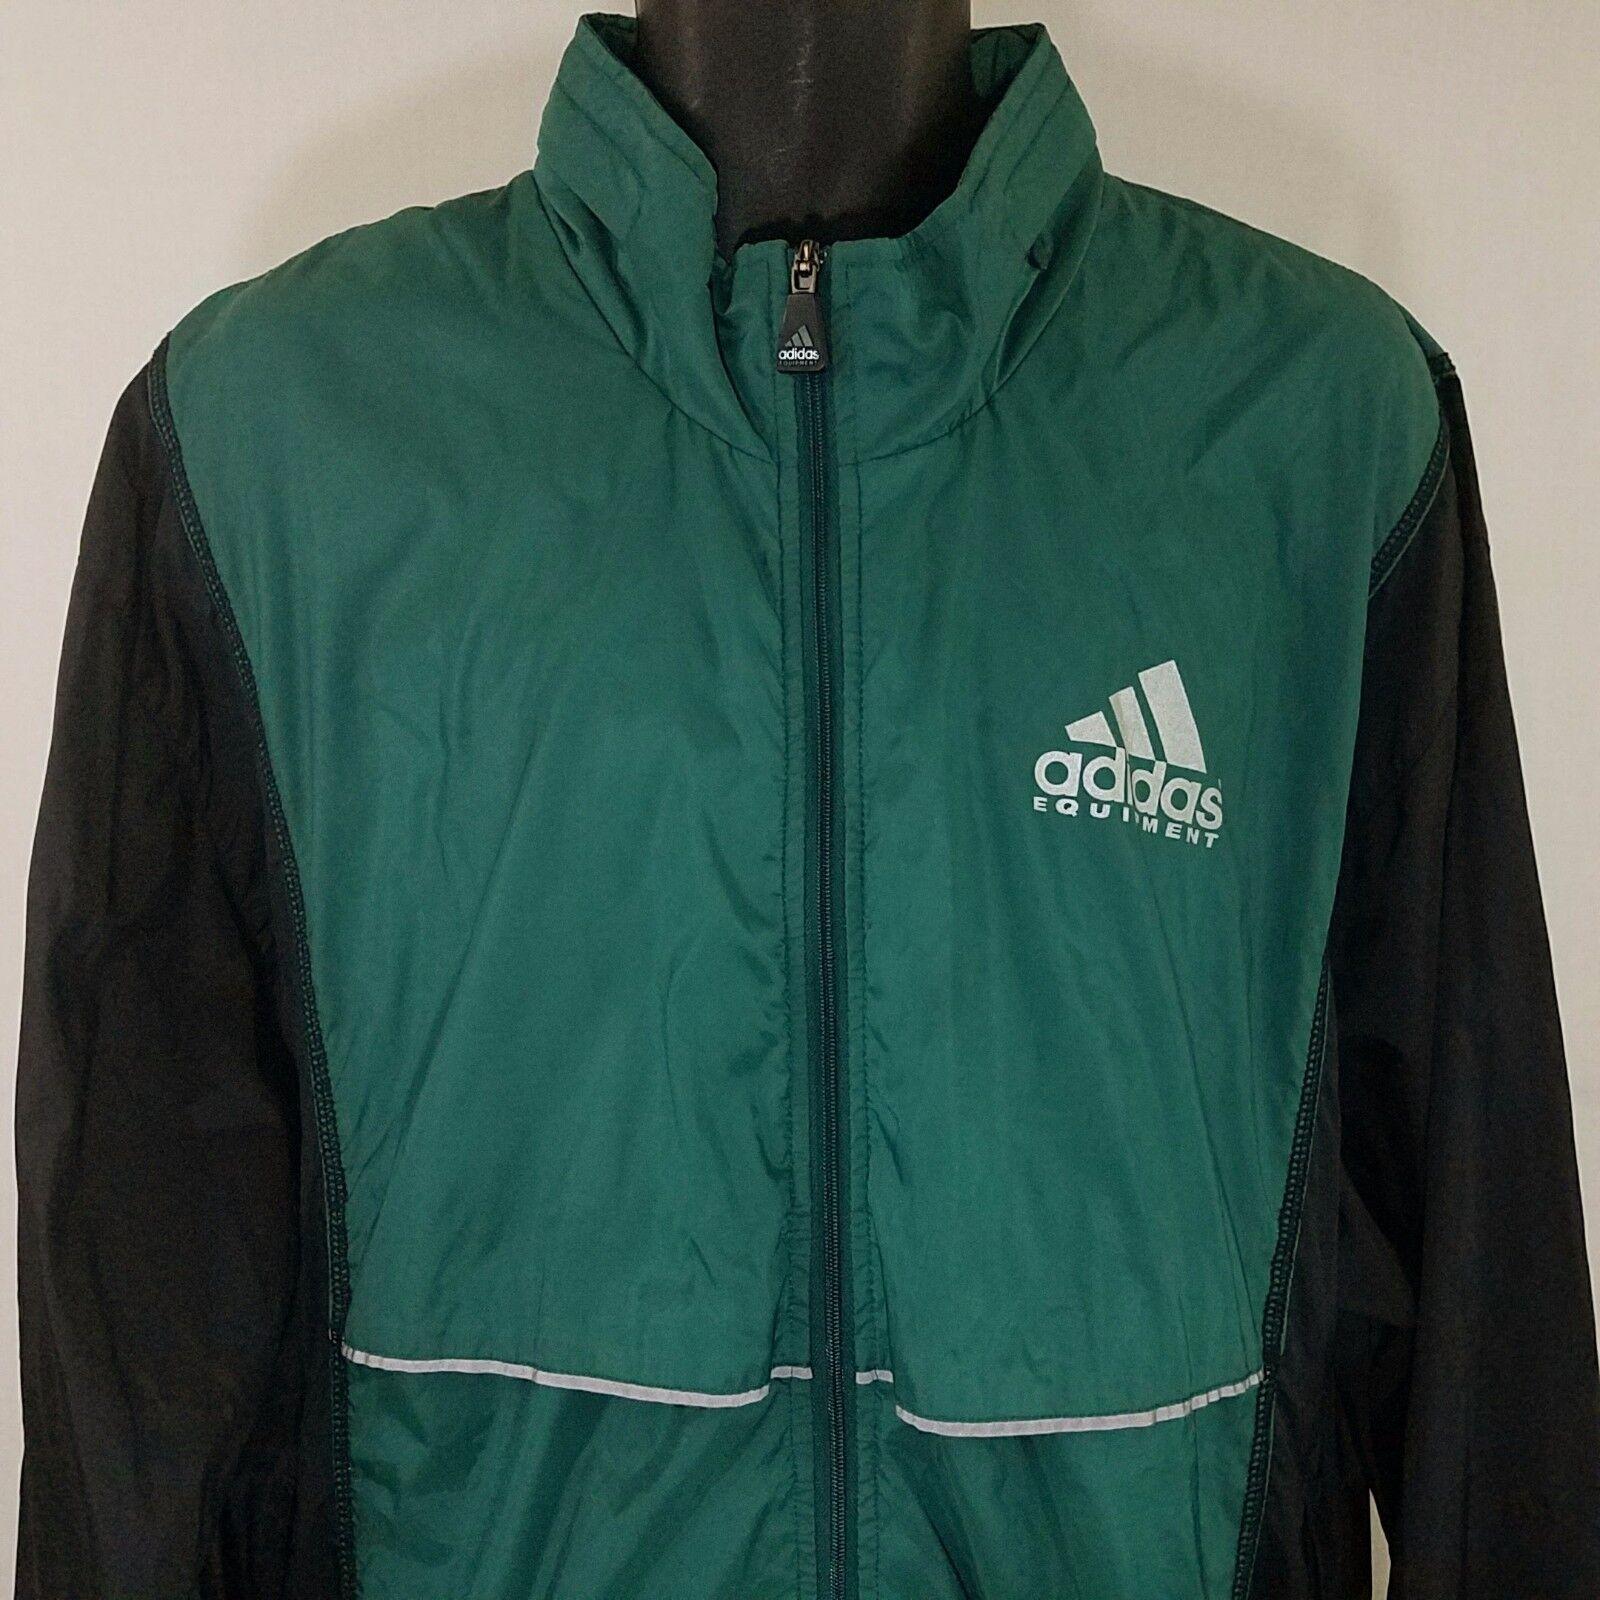 Adidas Equipment Uomo Windbreaker Jacket Vintage 90s Full Zip Roll Up Hood Large